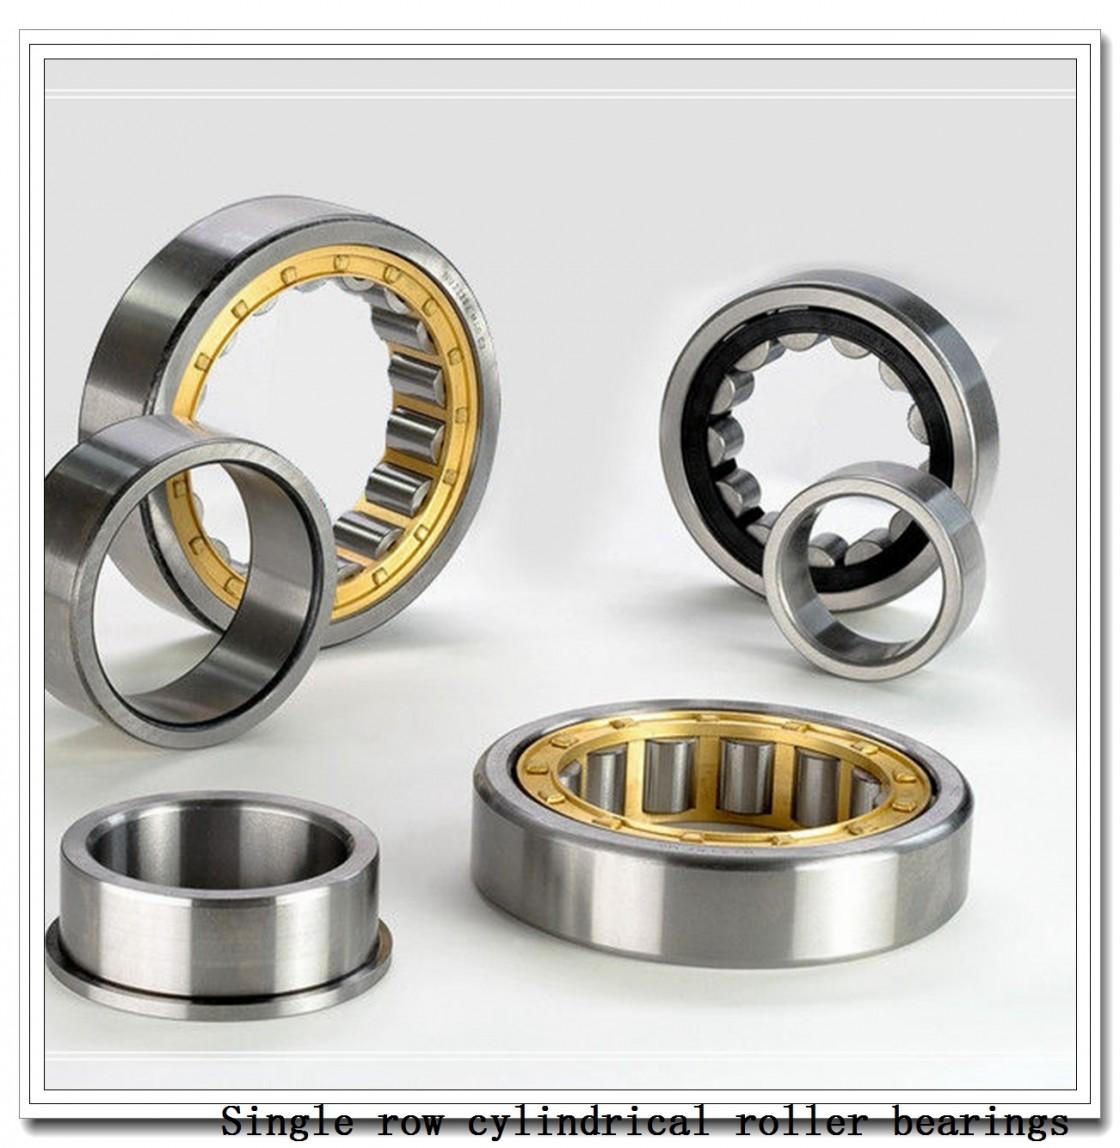 NU2252M Single row cylindrical roller bearings